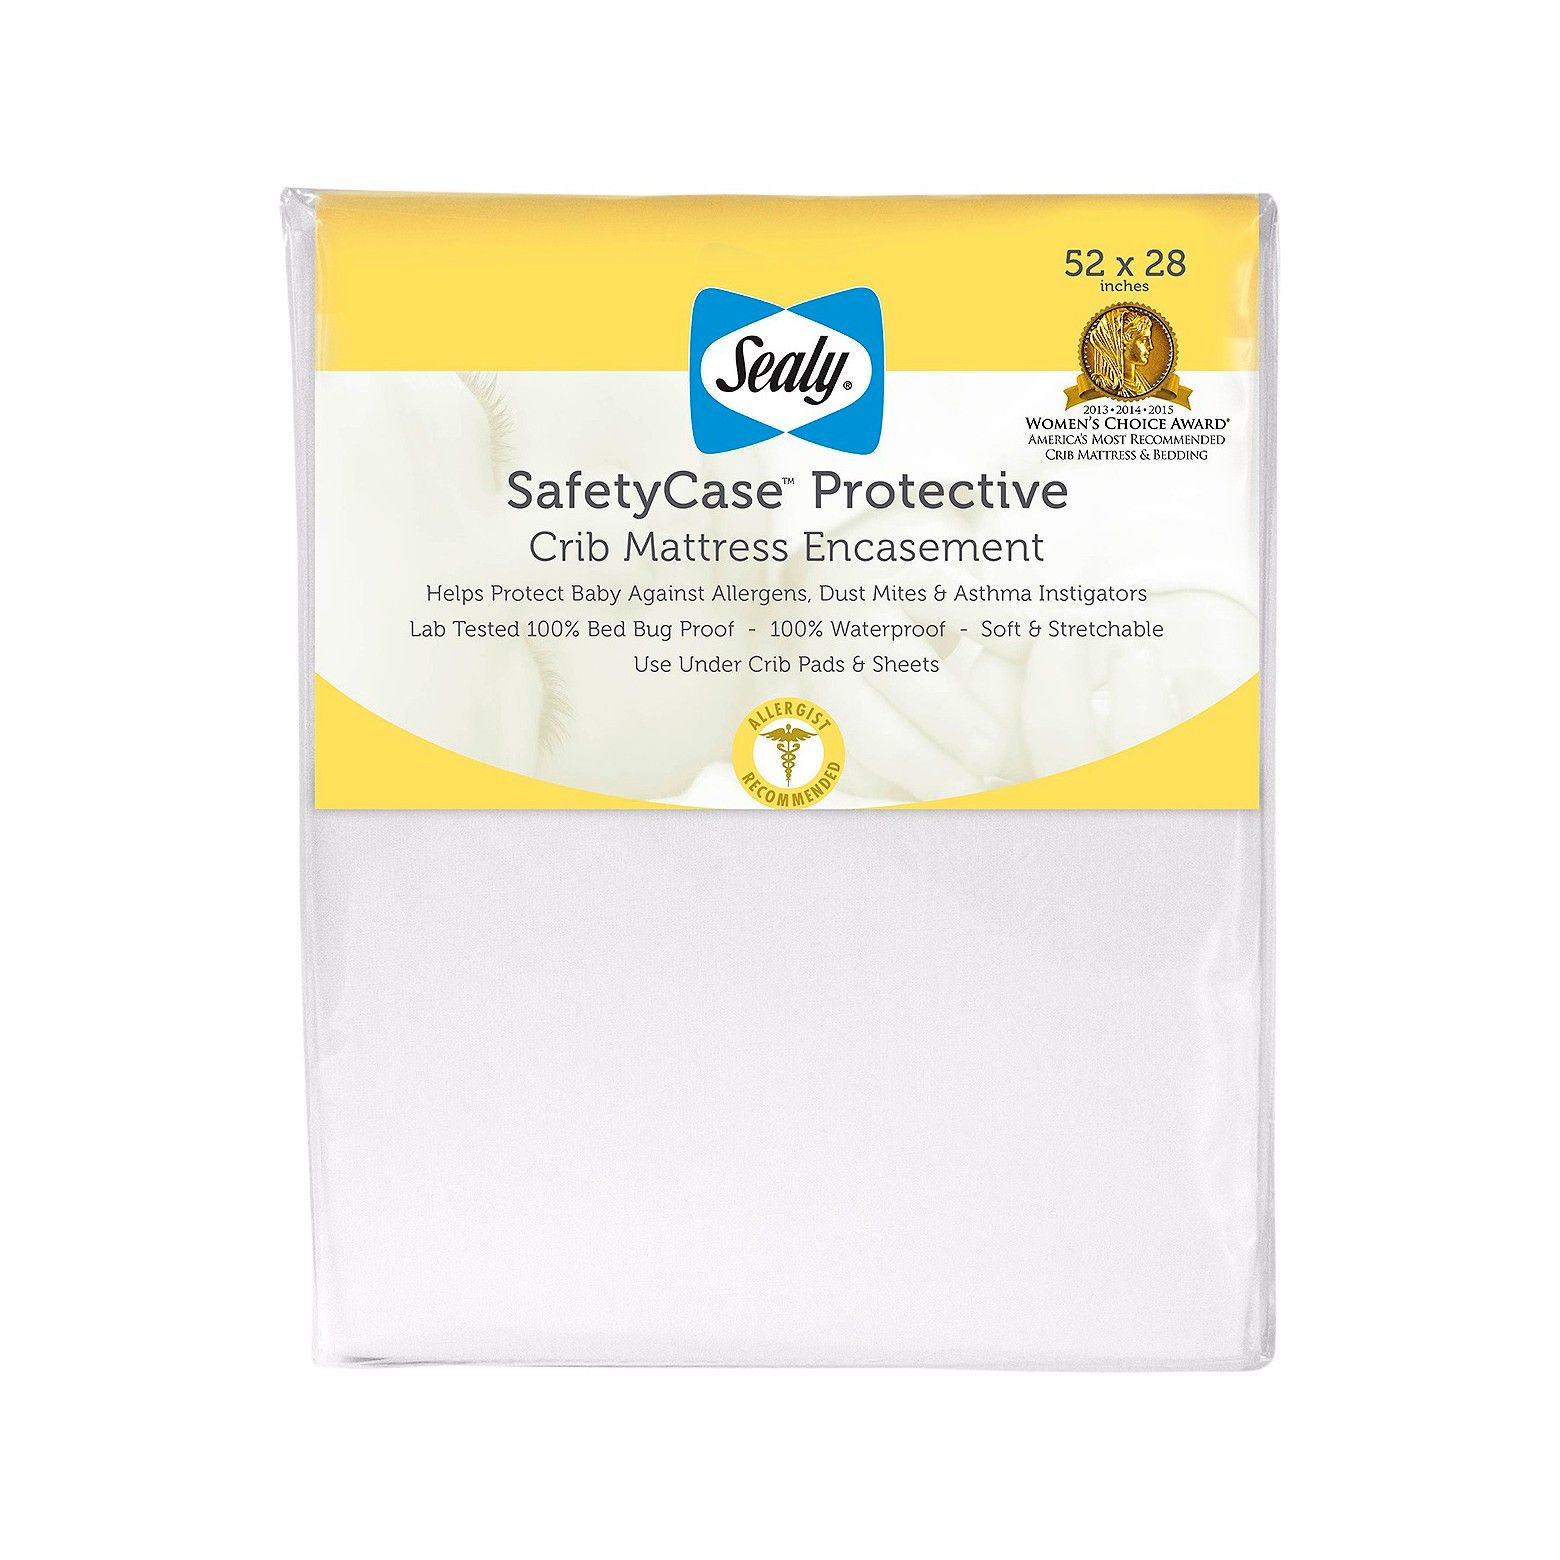 Sealy SafetyCase Protective Crib Mattress Encasement